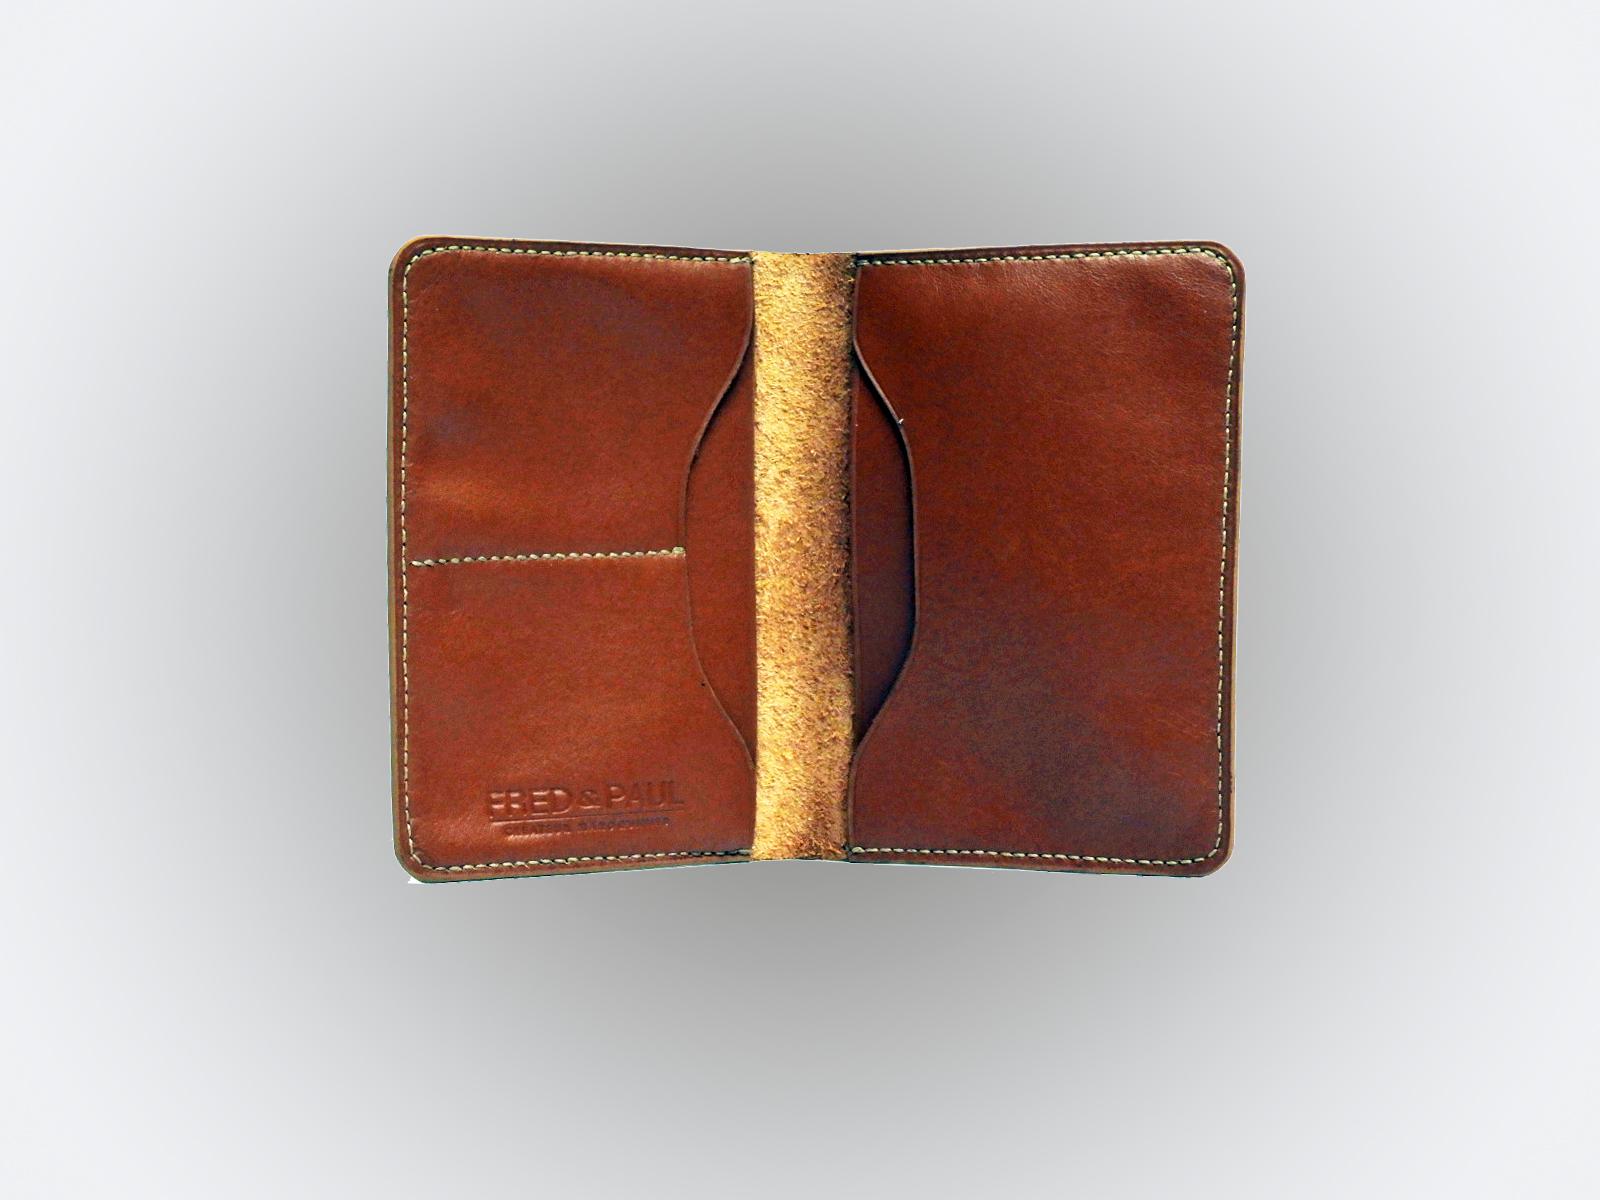 BALI, protège passeport en cuir de veau noisette